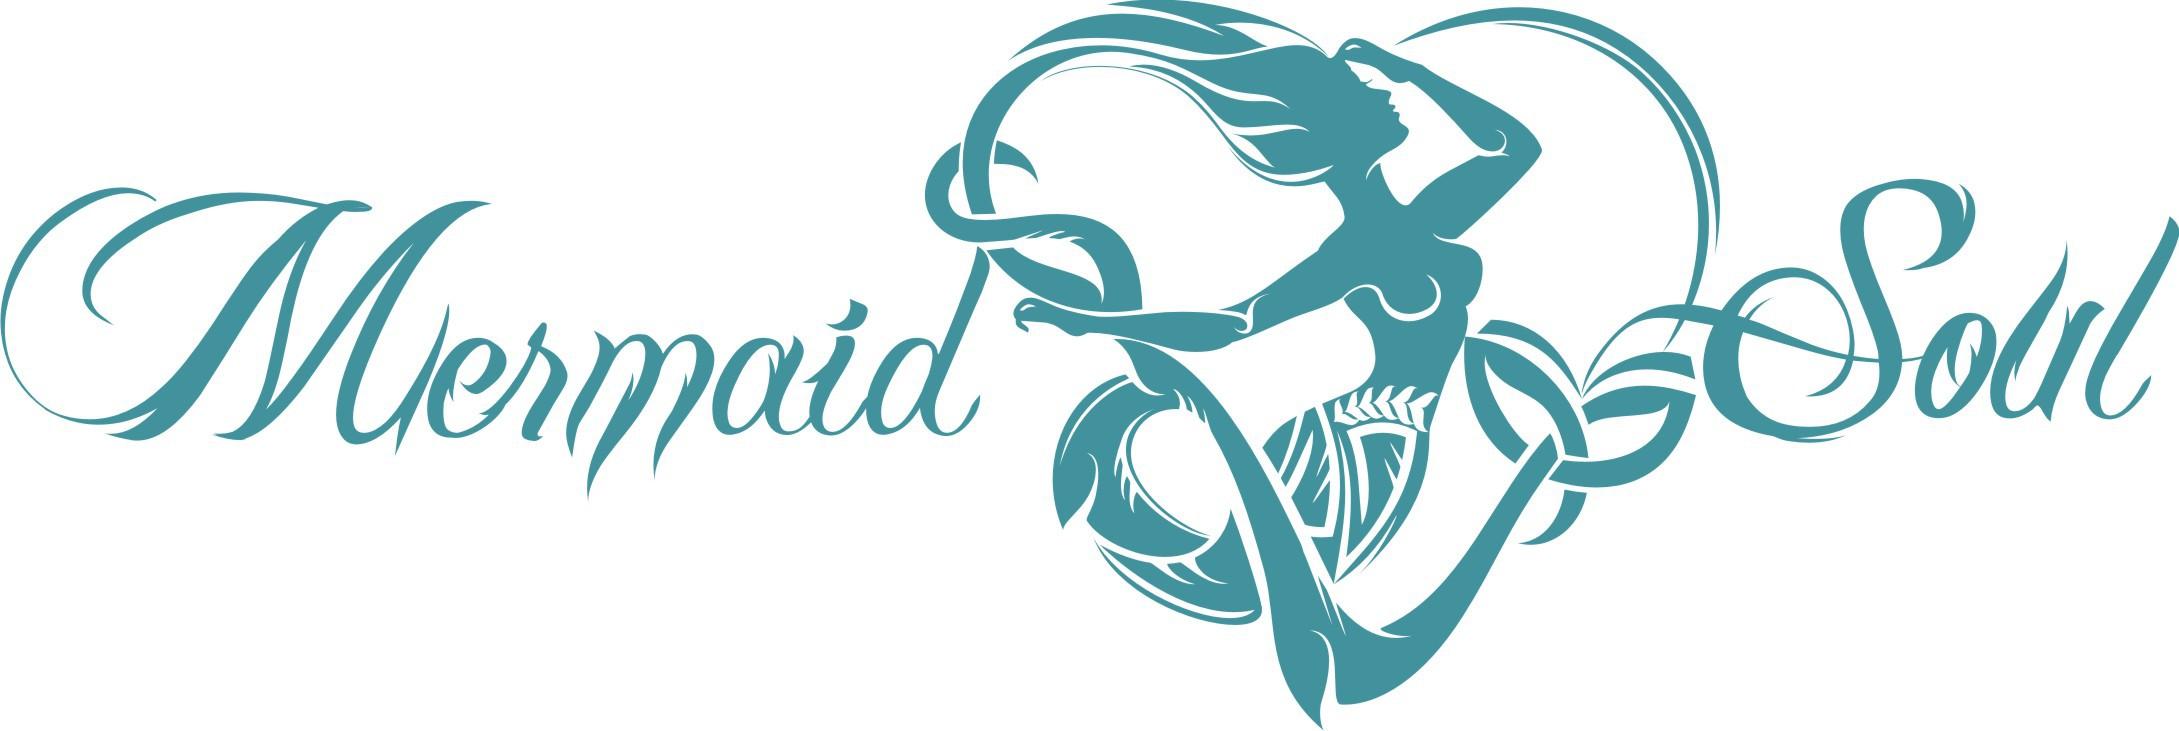 Mermaid Soul needs an iconic logo